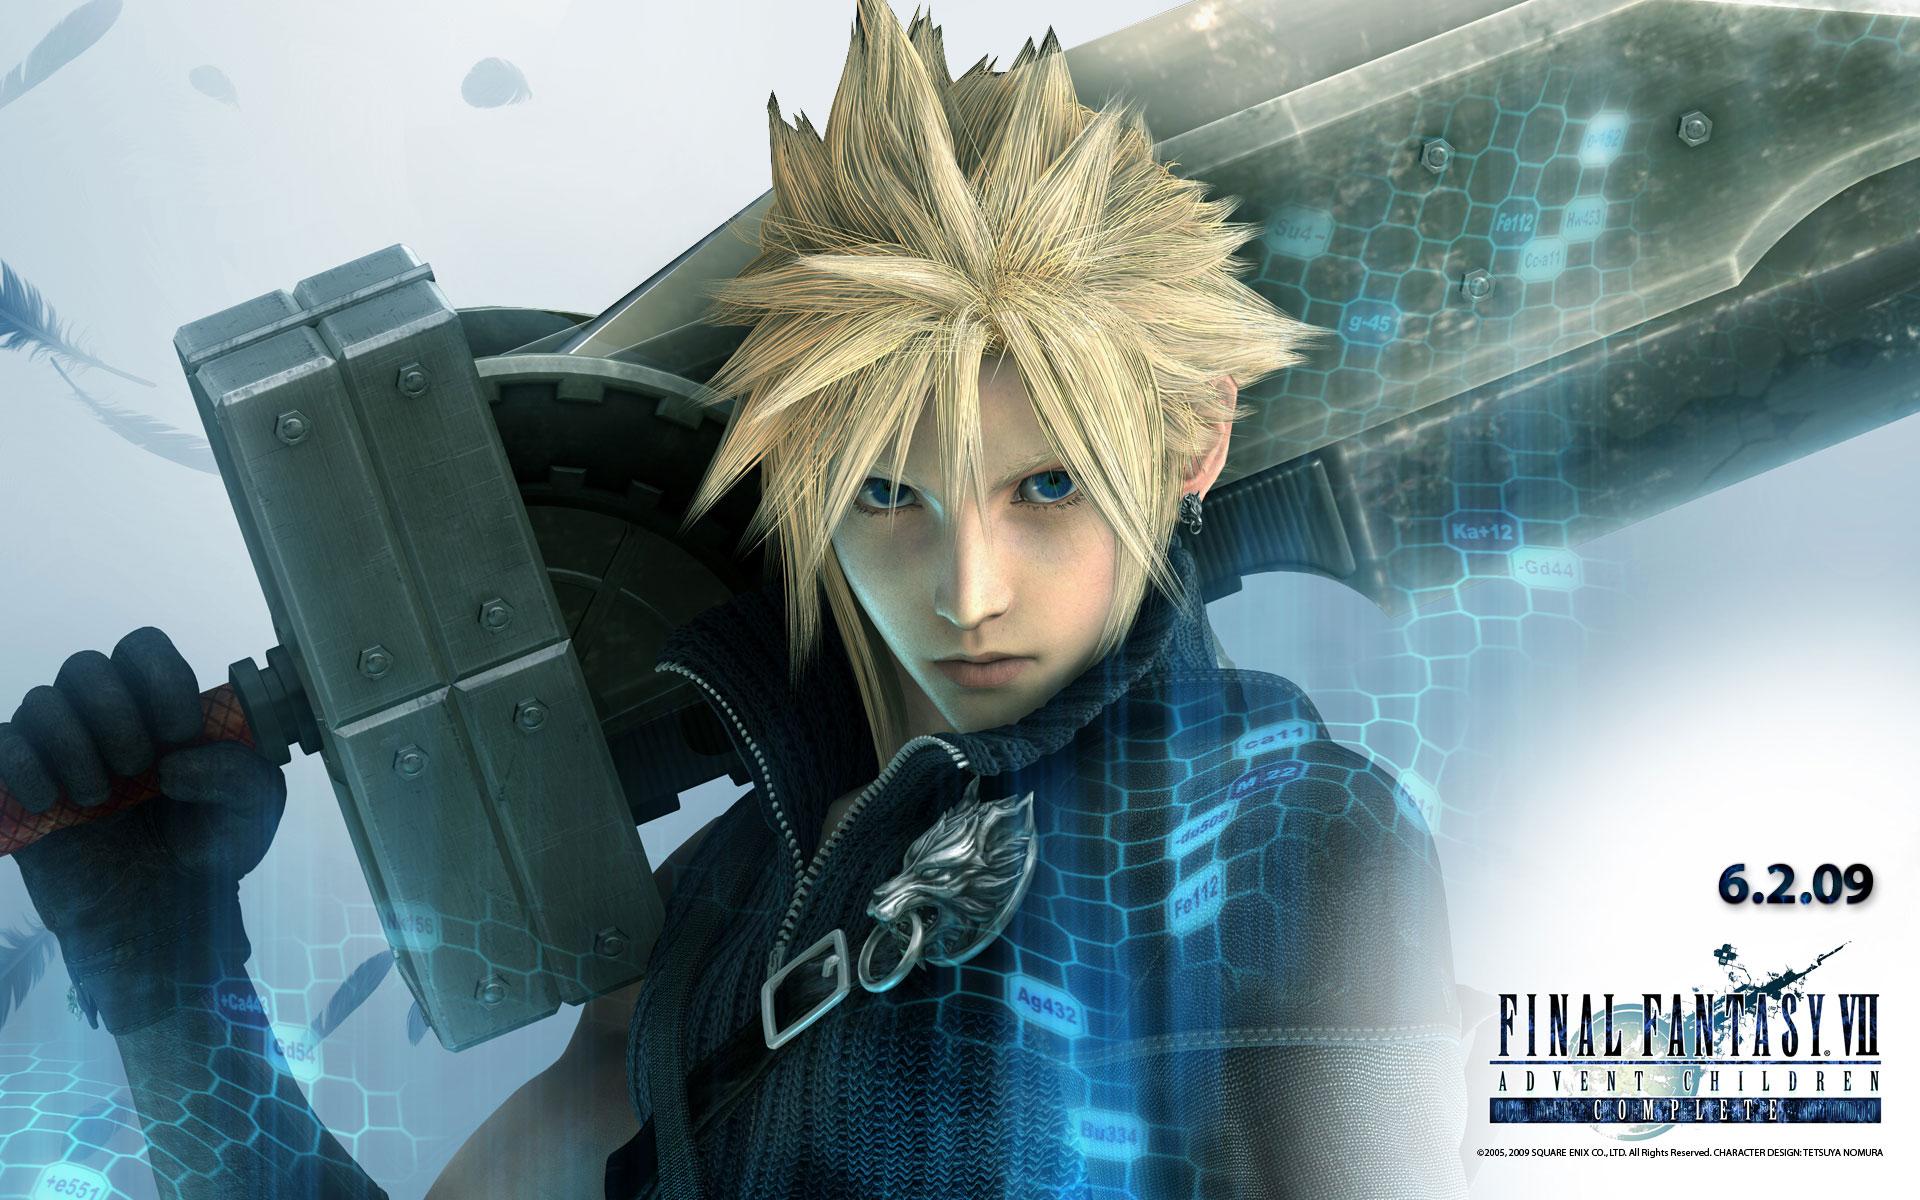 Cloud Final Fantasy Vii Wallpaper Details and Download Free